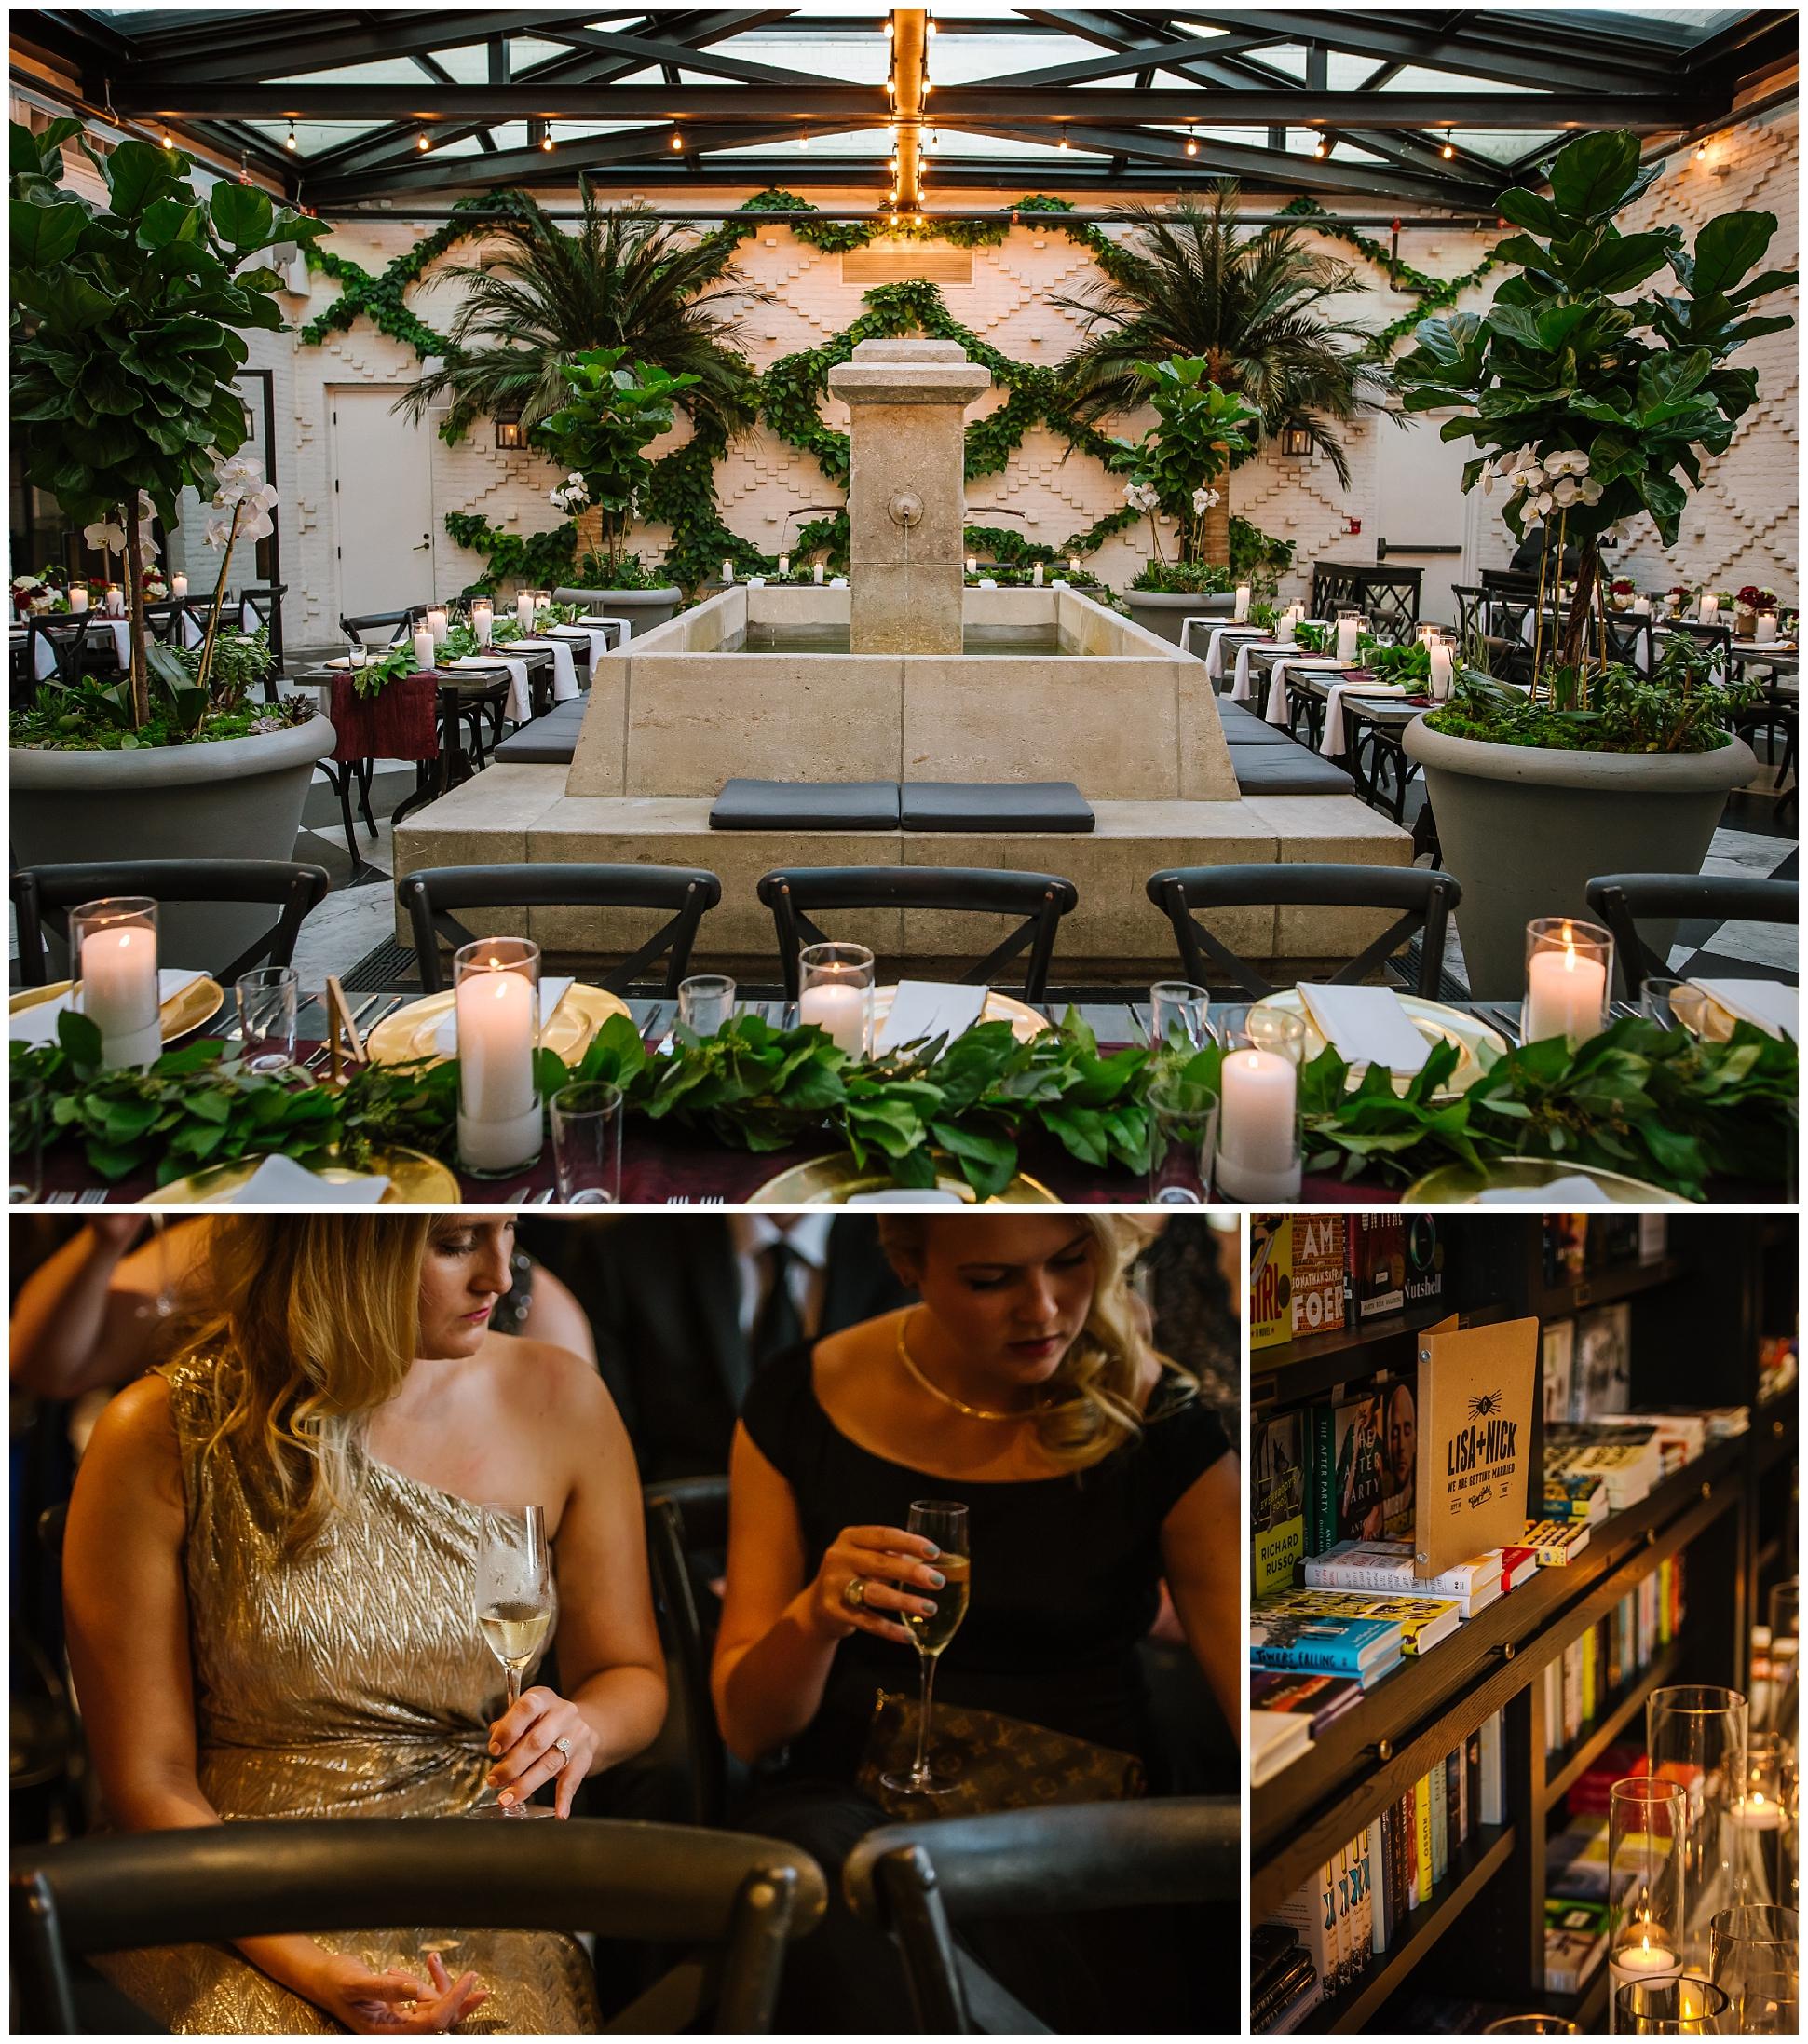 Oxford-exchange-wedding-photogapher-garland-candels-bookstore-burgandy-botanica_0044.jpg